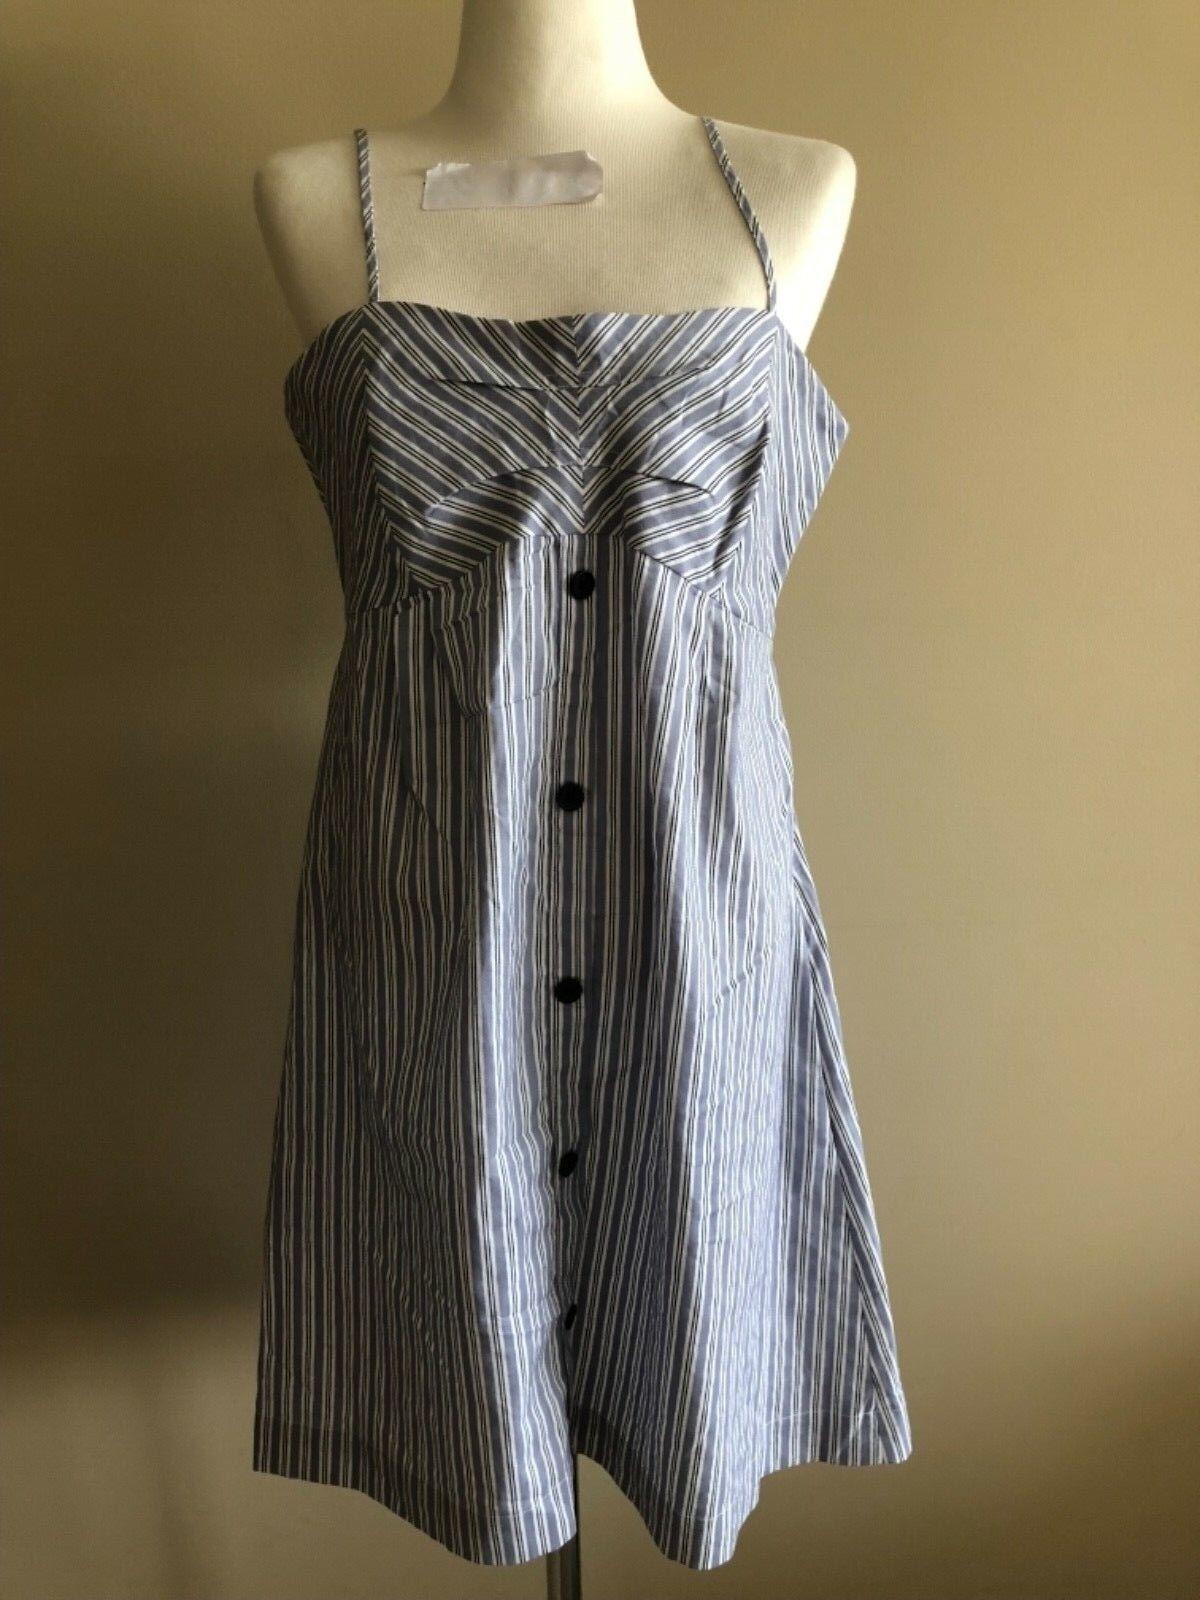 Striped Luigi Bertolli short dress in size 40, Aus 10, NWT